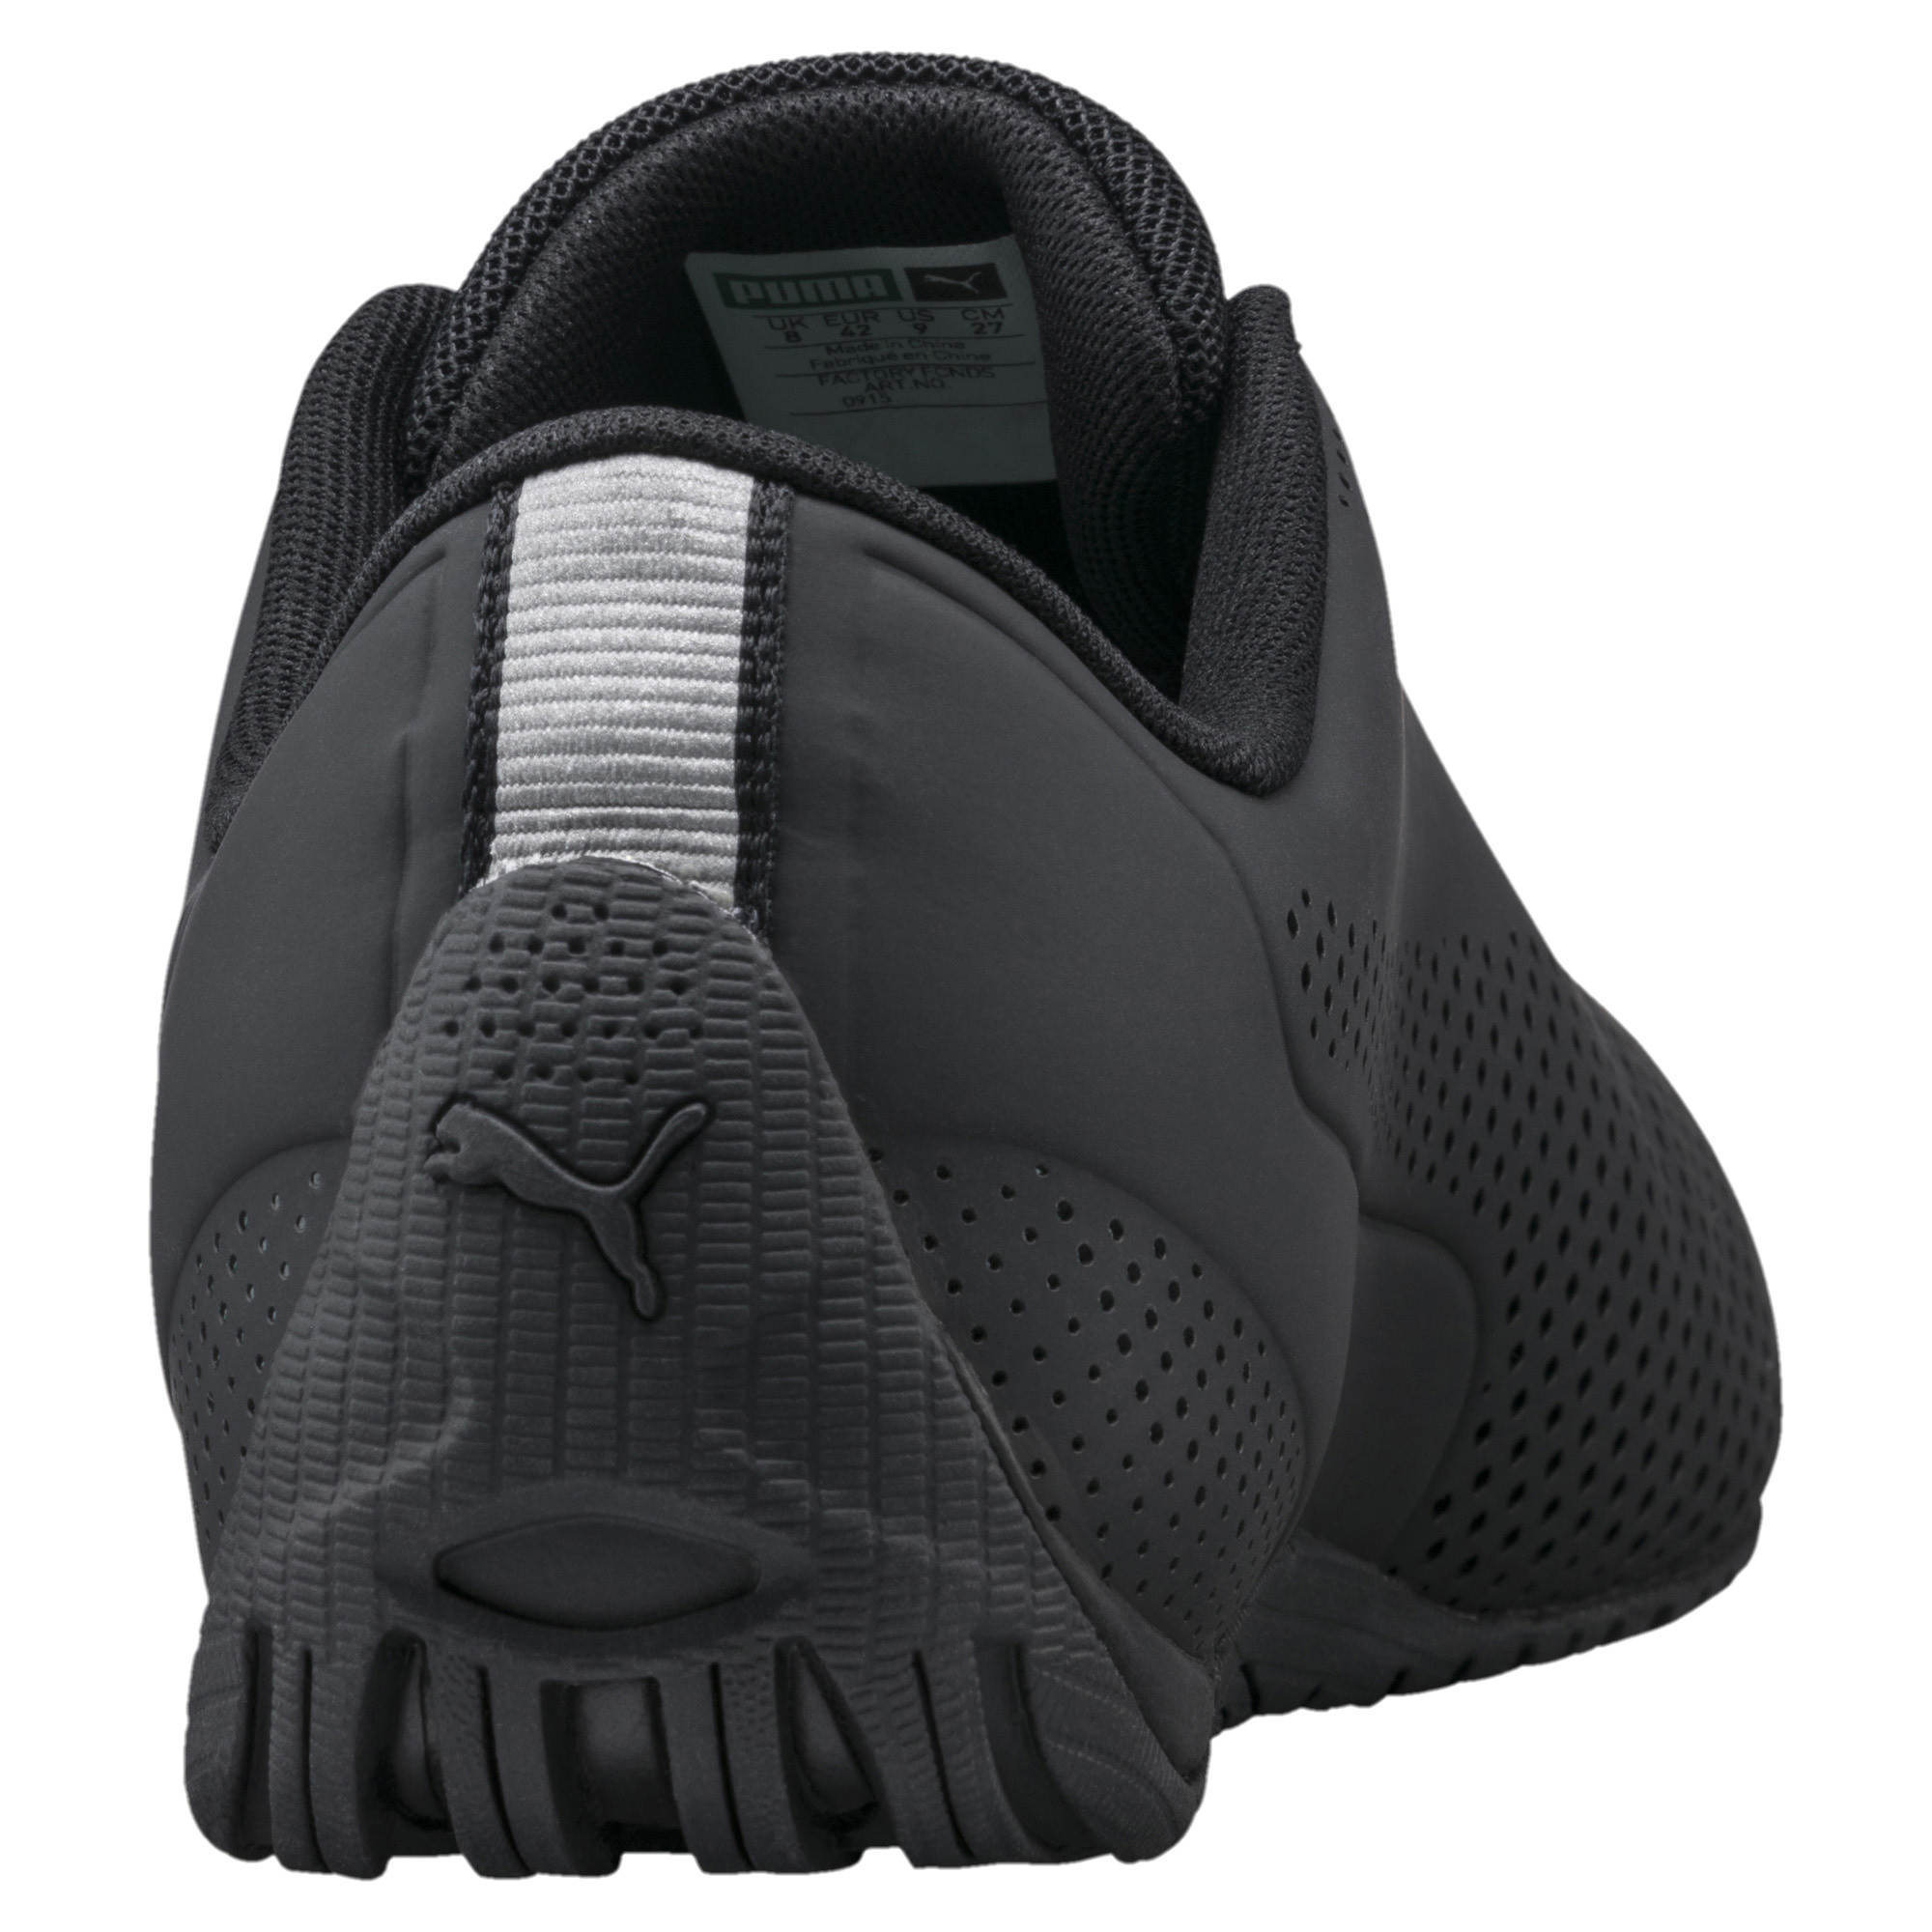 PUMA-Drift-Cat-Ultra-Reflective-Men-039-s-Shoes-Men-Shoe-Sport-Classics thumbnail 3